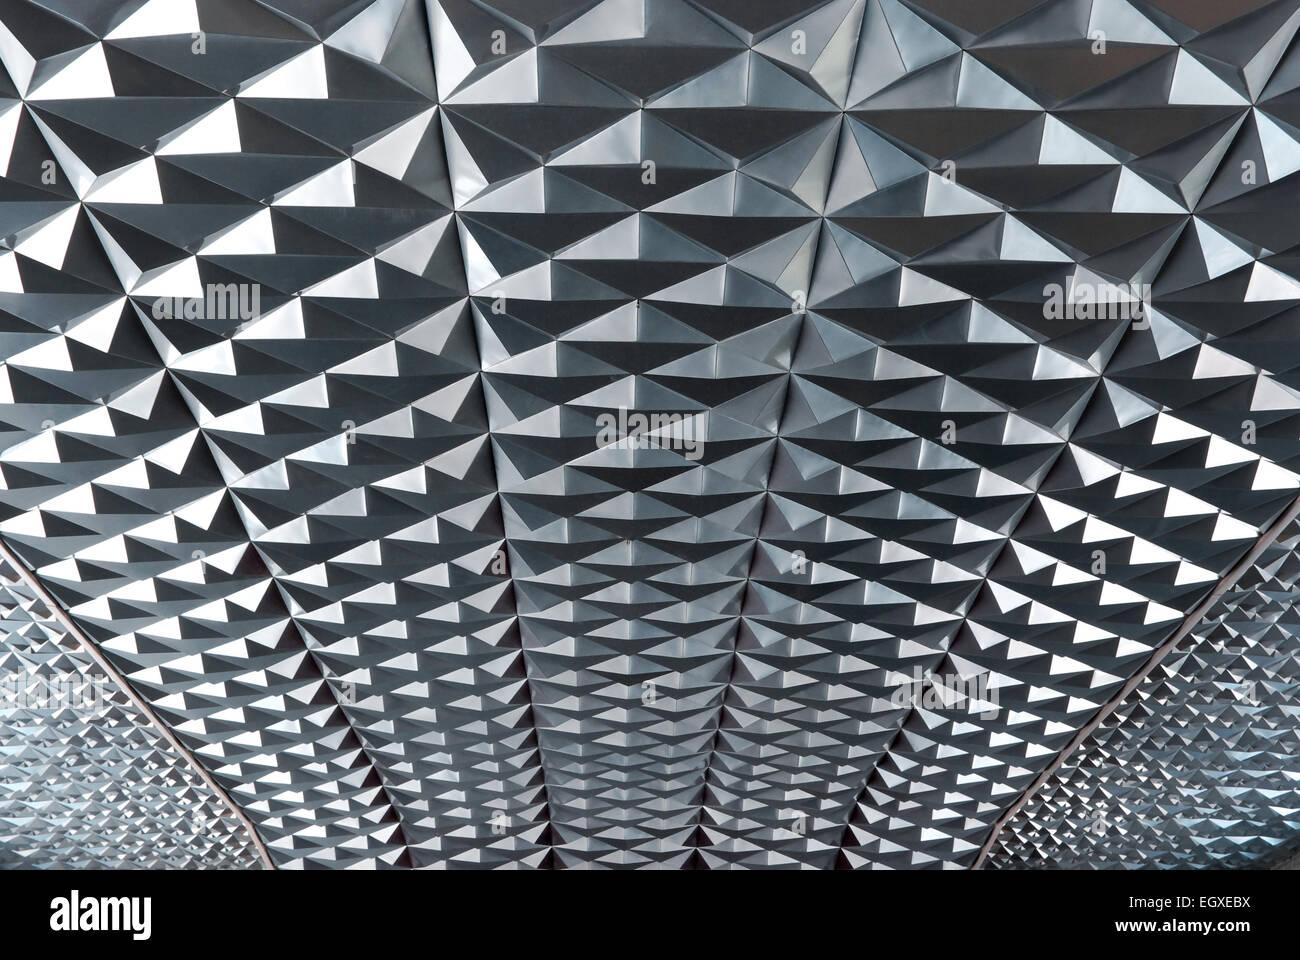 Textured geometry. Element of design. - Stock Image